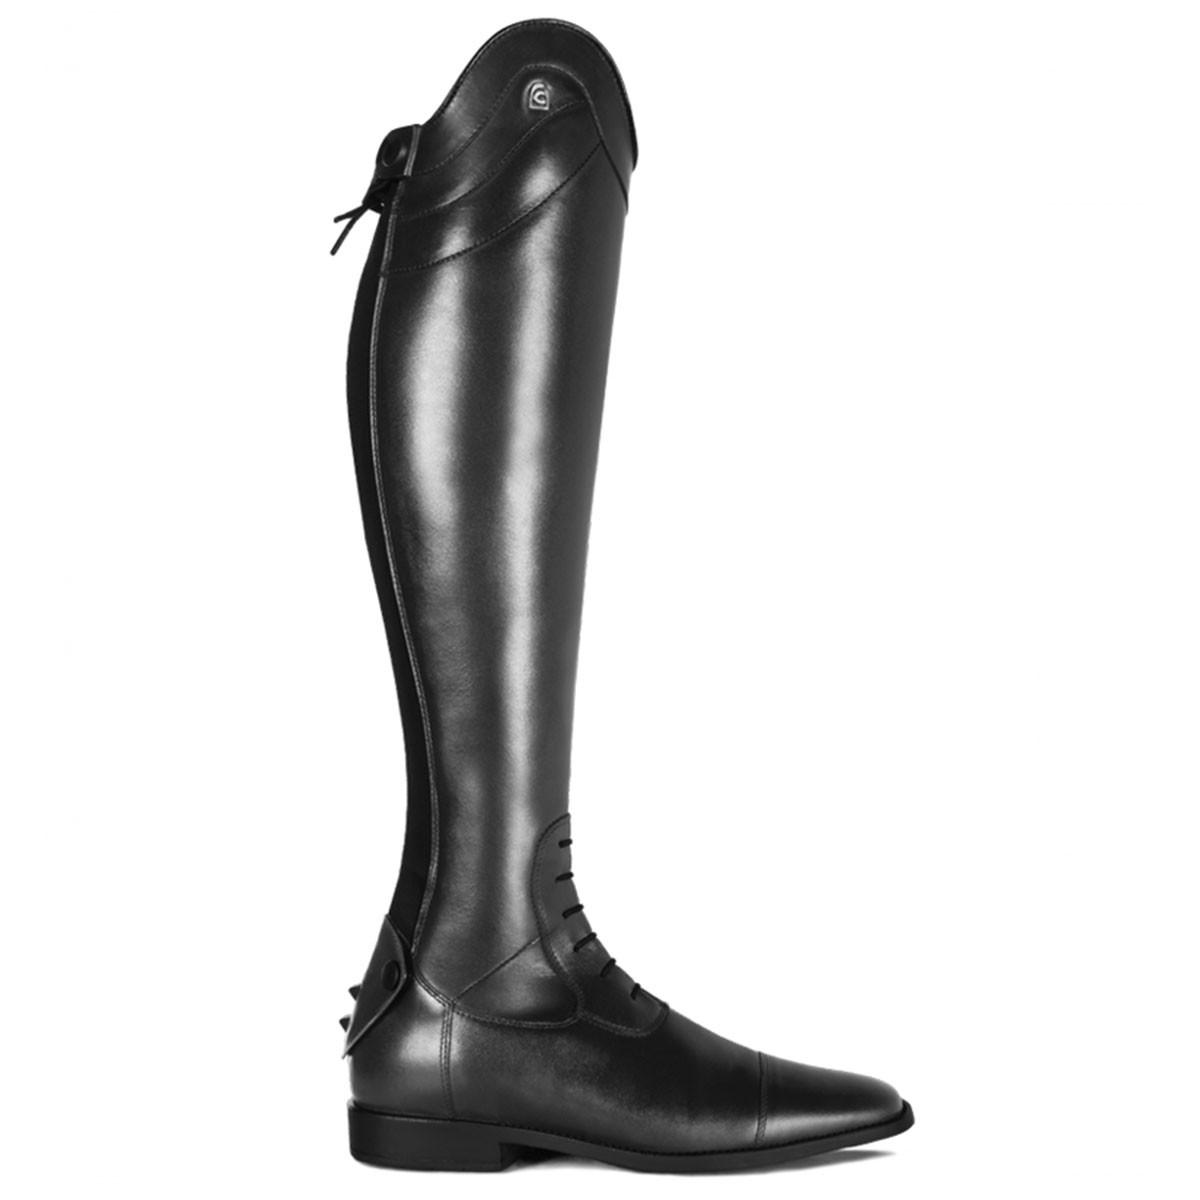 Cavallo Linus Slim rijlaars zwart maat:5-5.5 / h48-w34